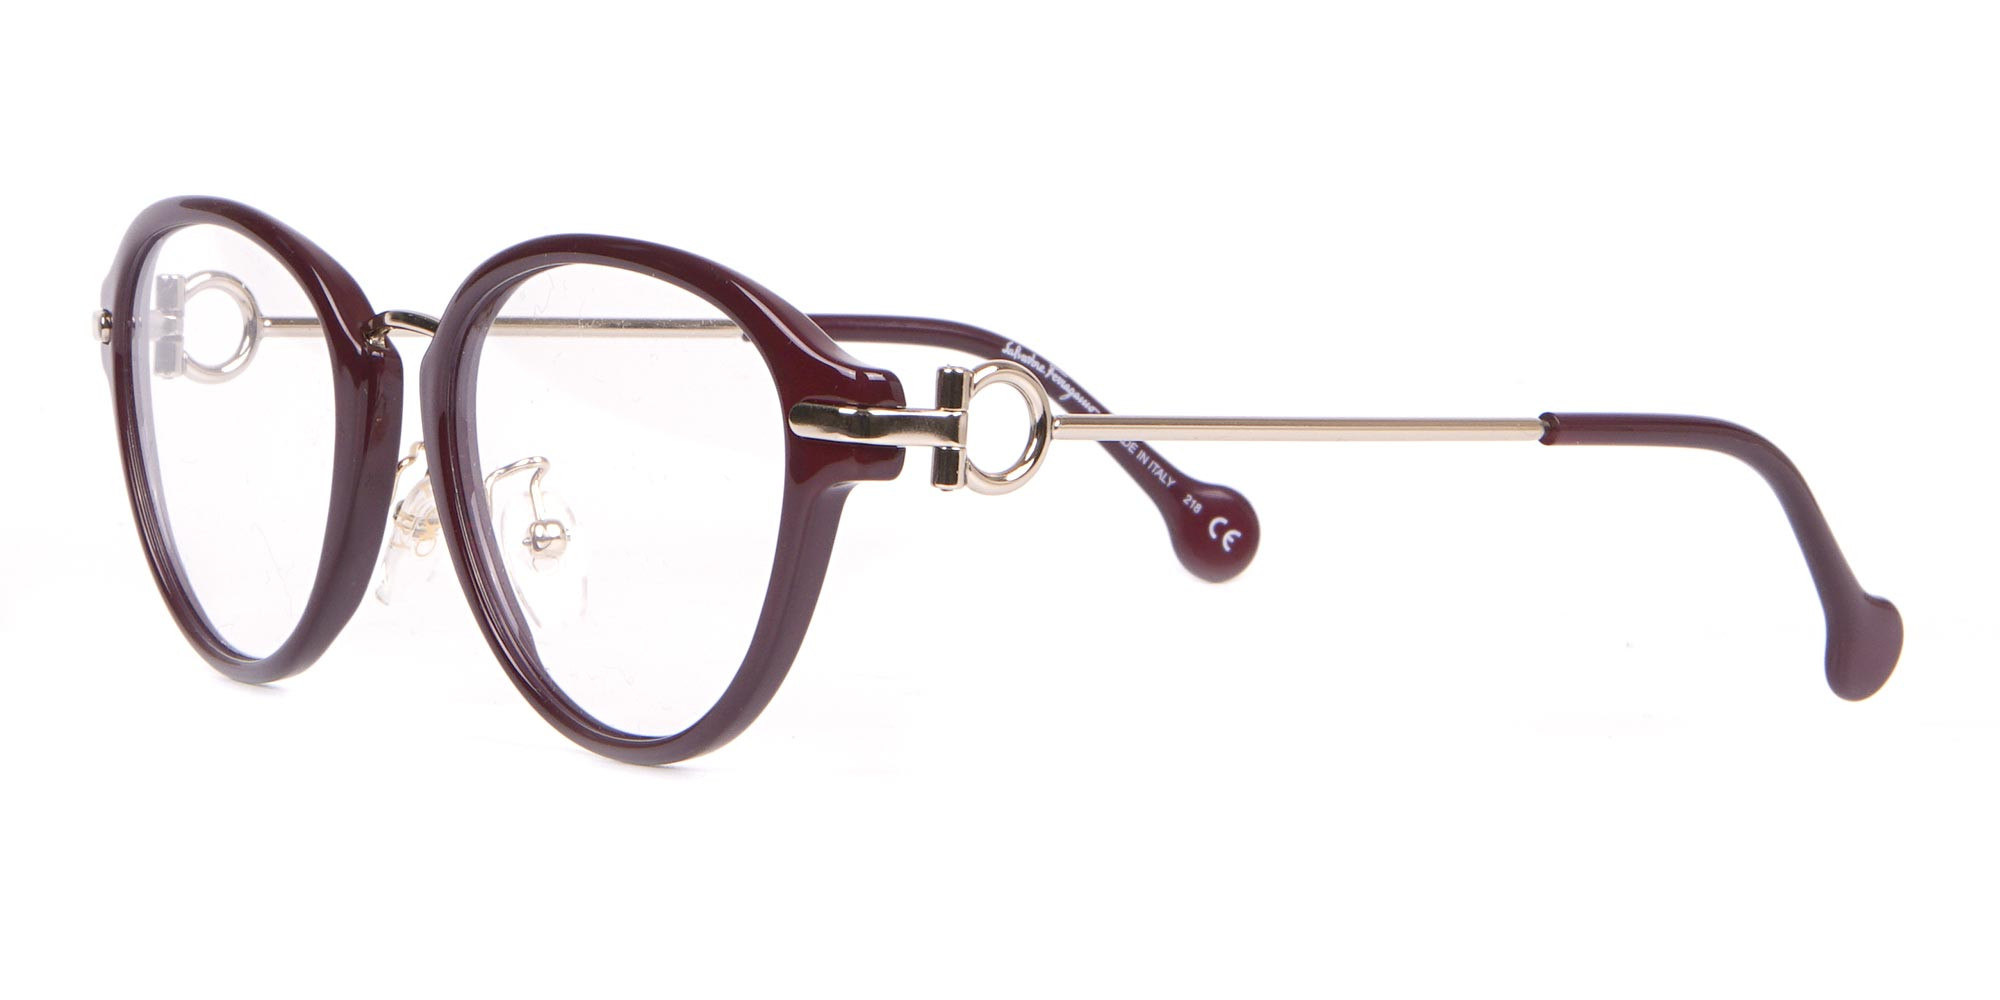 Salvatore Ferragamo SF2826 Women Round Glasses Burgundy-3